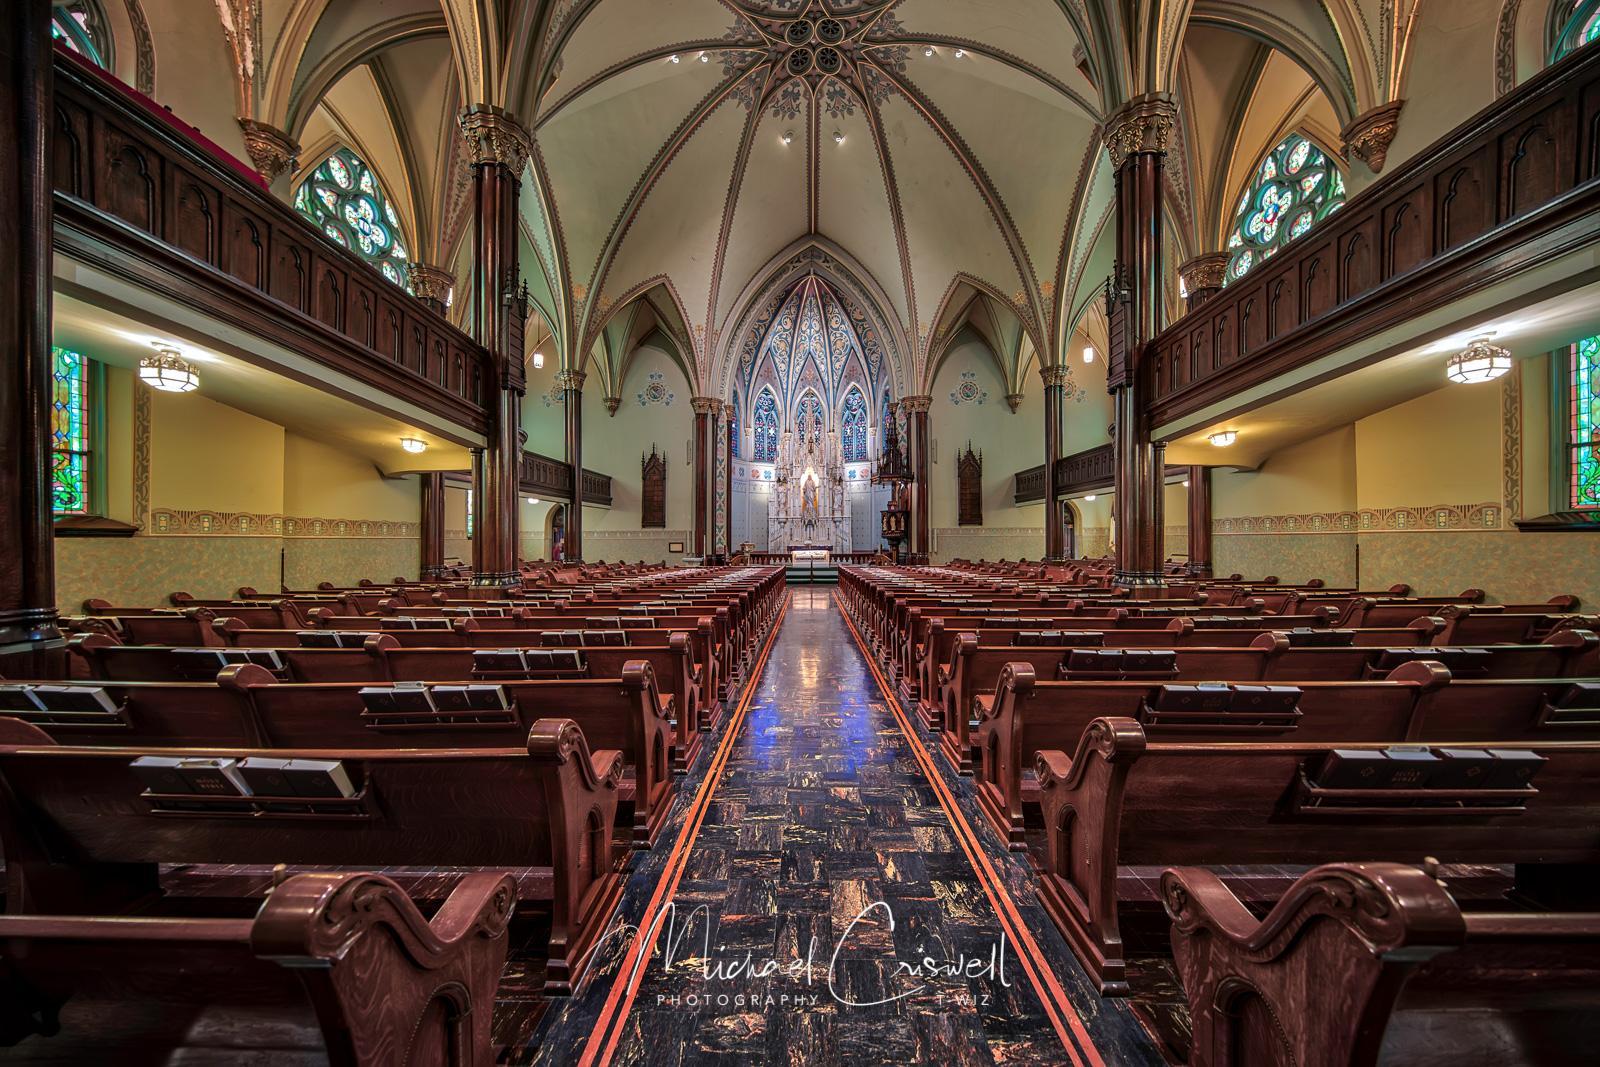 St Paul's Evangelical